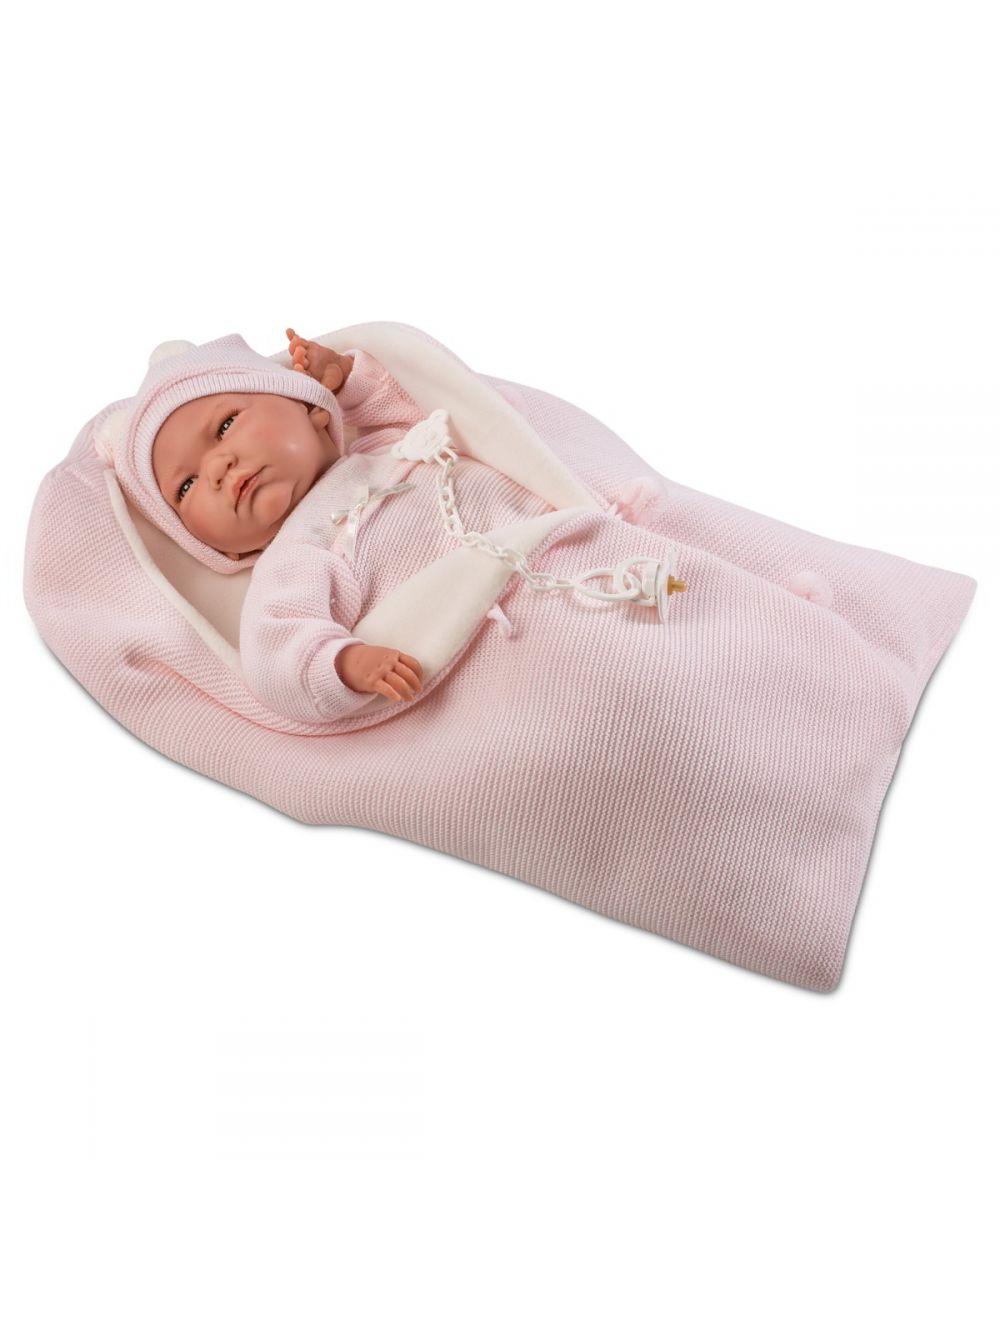 LLORENS Lalka Lala w różowym śpiworku 40 cm